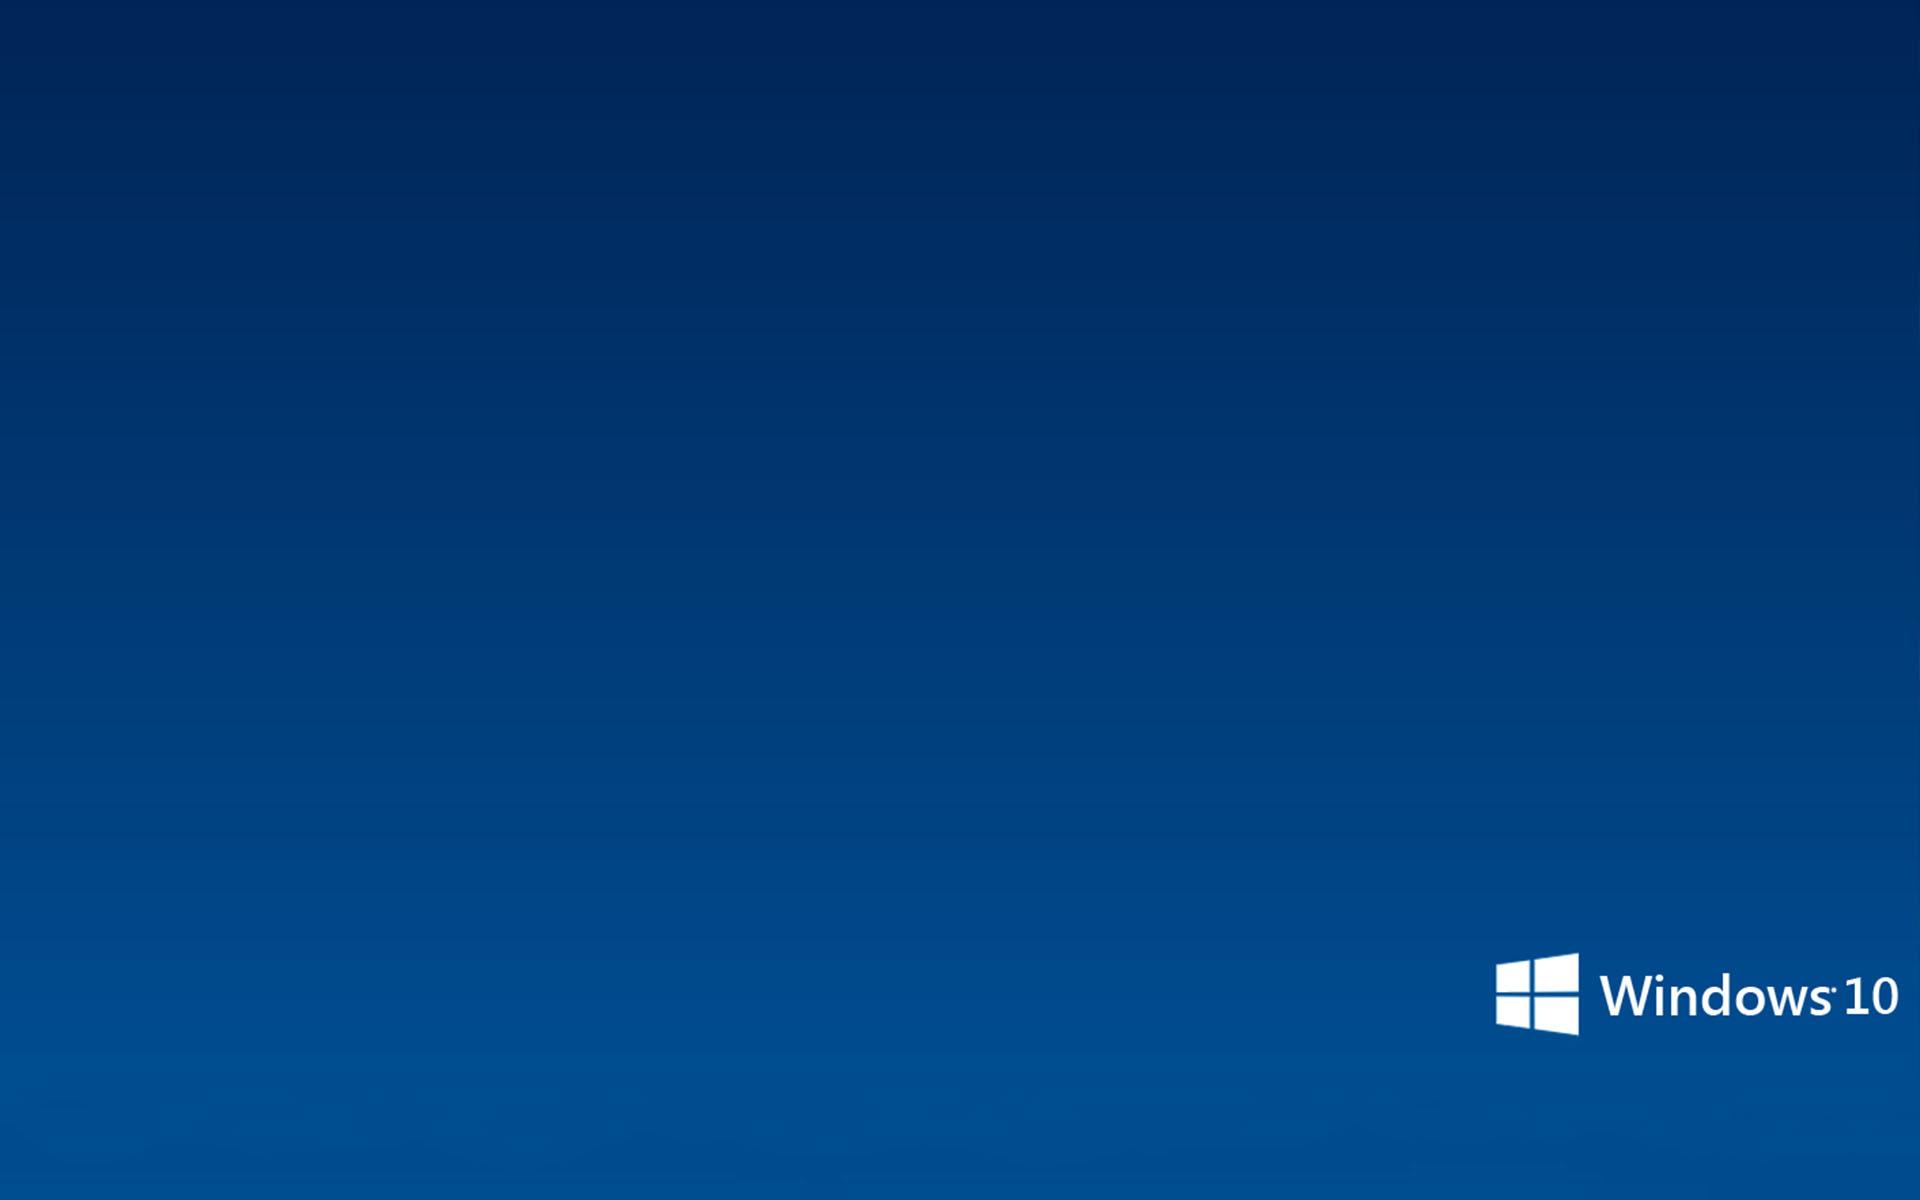 Free Download Simple Microsoft Windows 10 Wallpaper Wallpapers